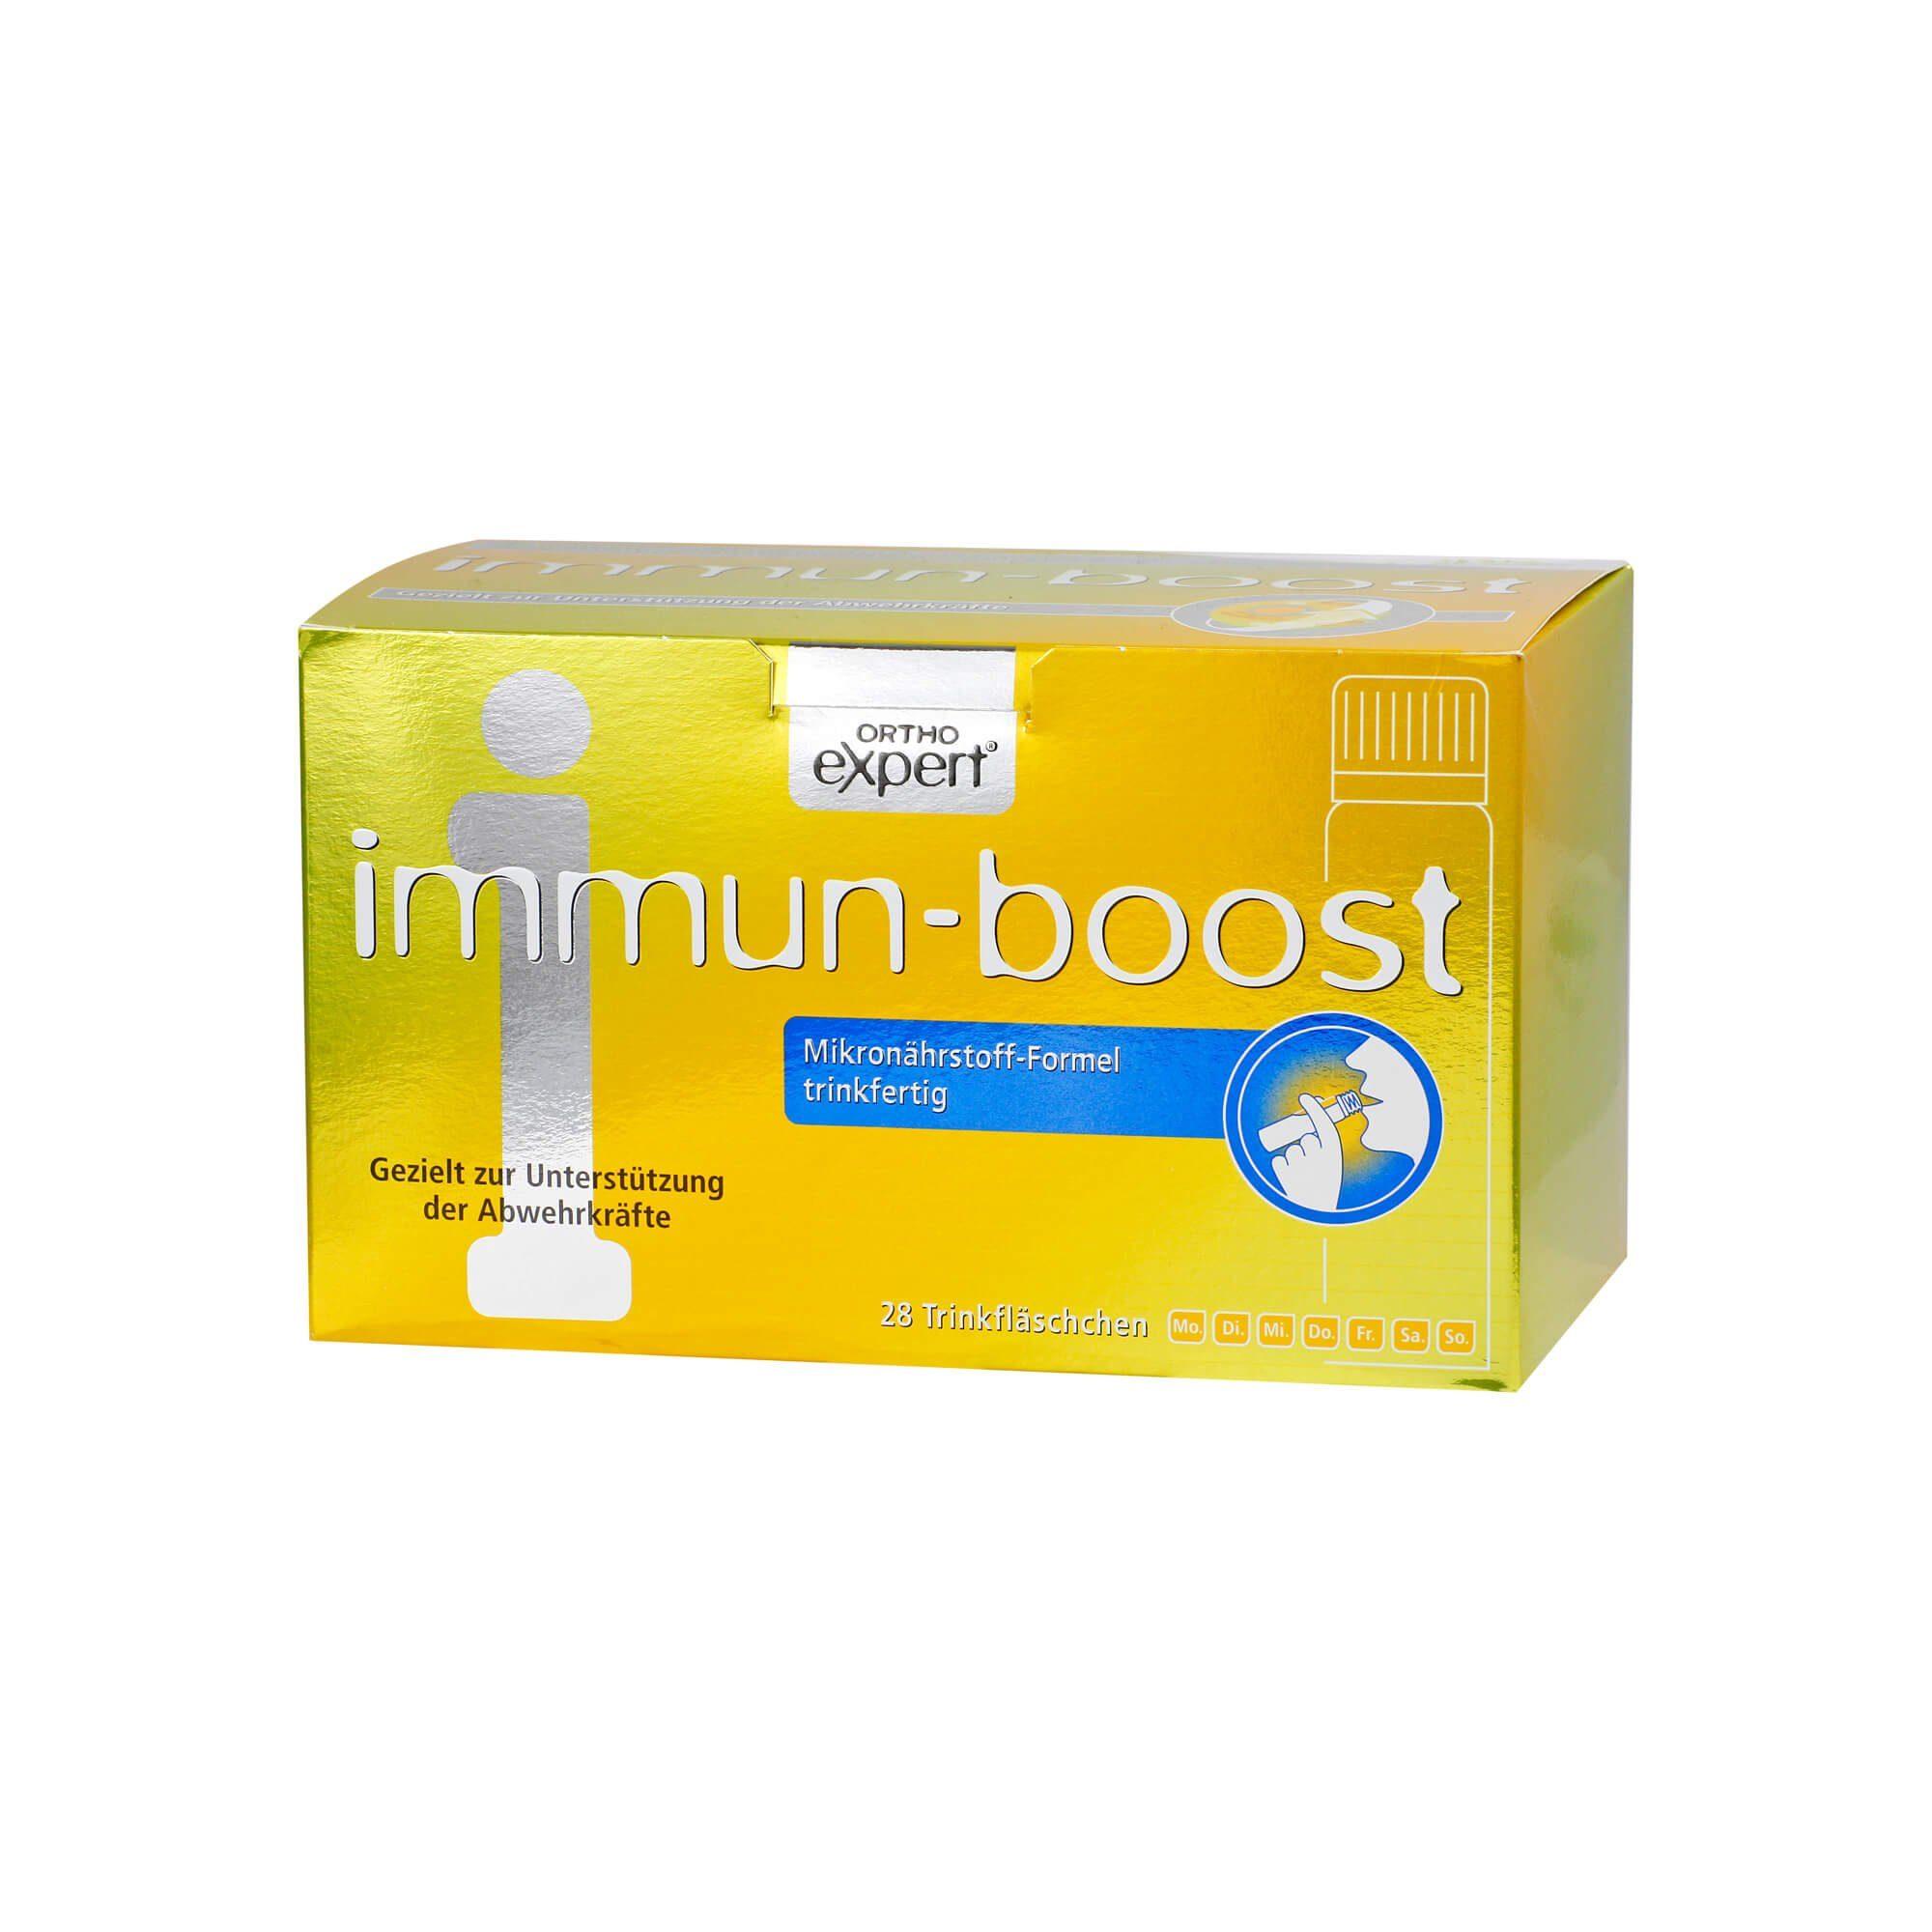 Immun-boost Orthoexpert Trinkampullen , 28X25 ml